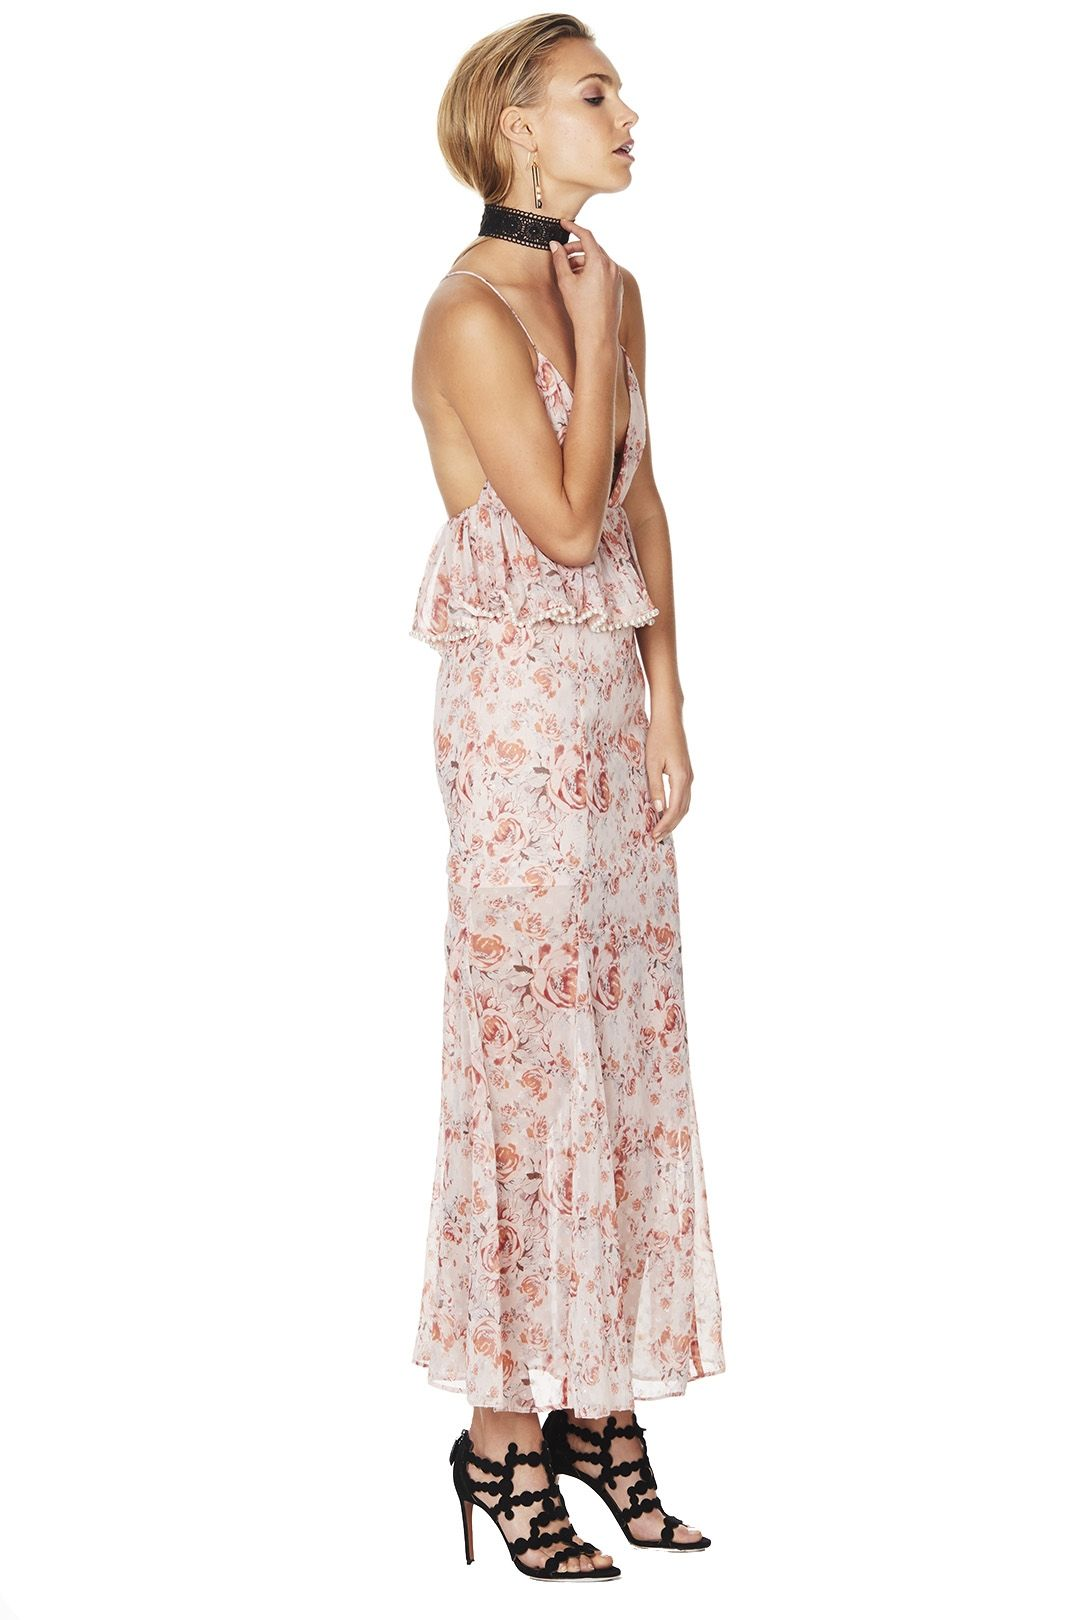 Talulah - The Faithful Maxi Dress - Pink Floral - Side